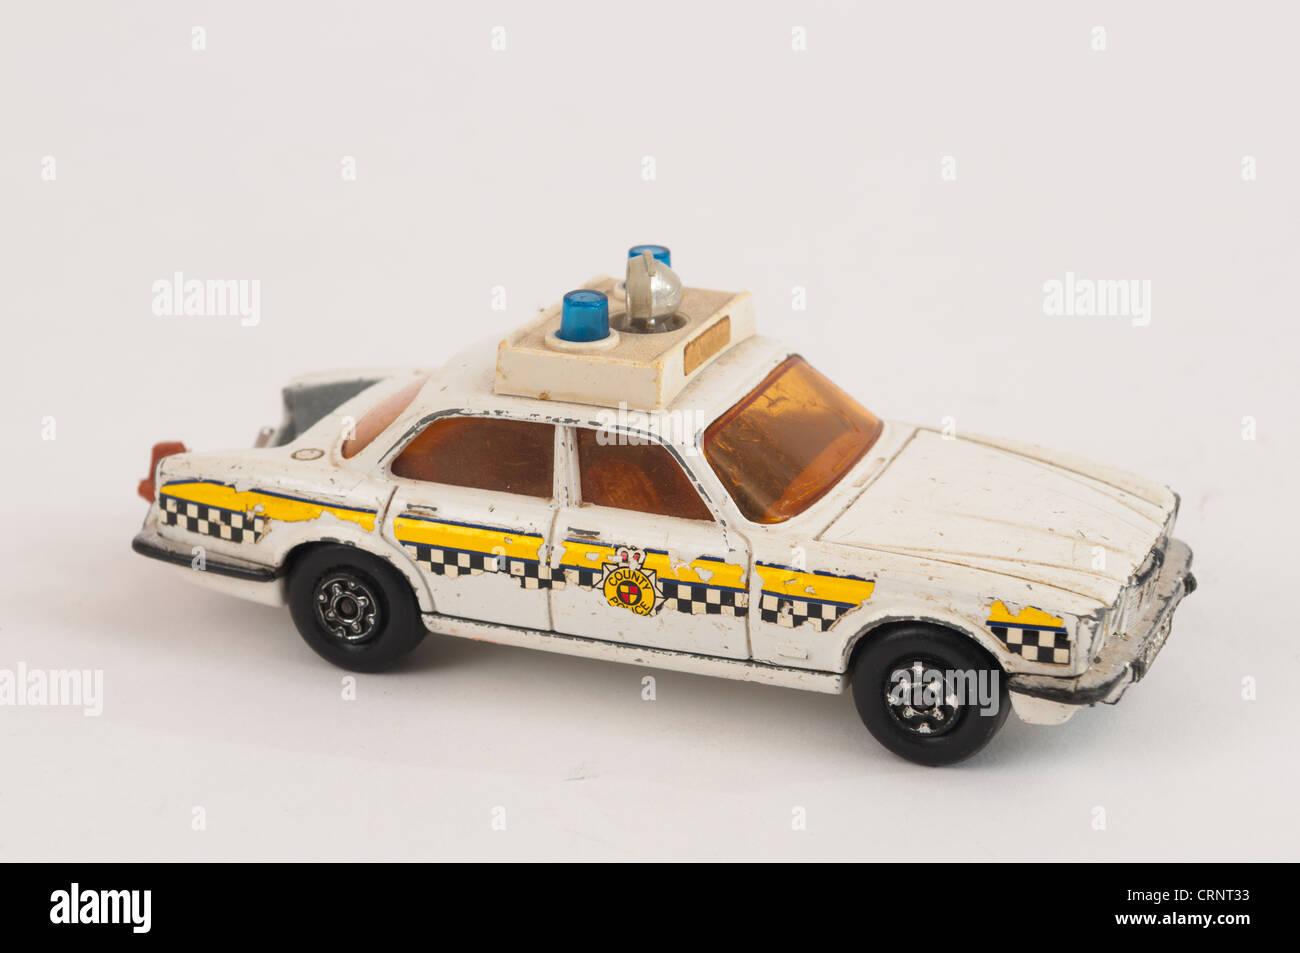 Matchbox Super Kings Jaguar XJ12 Police Car Toy Stock Photo